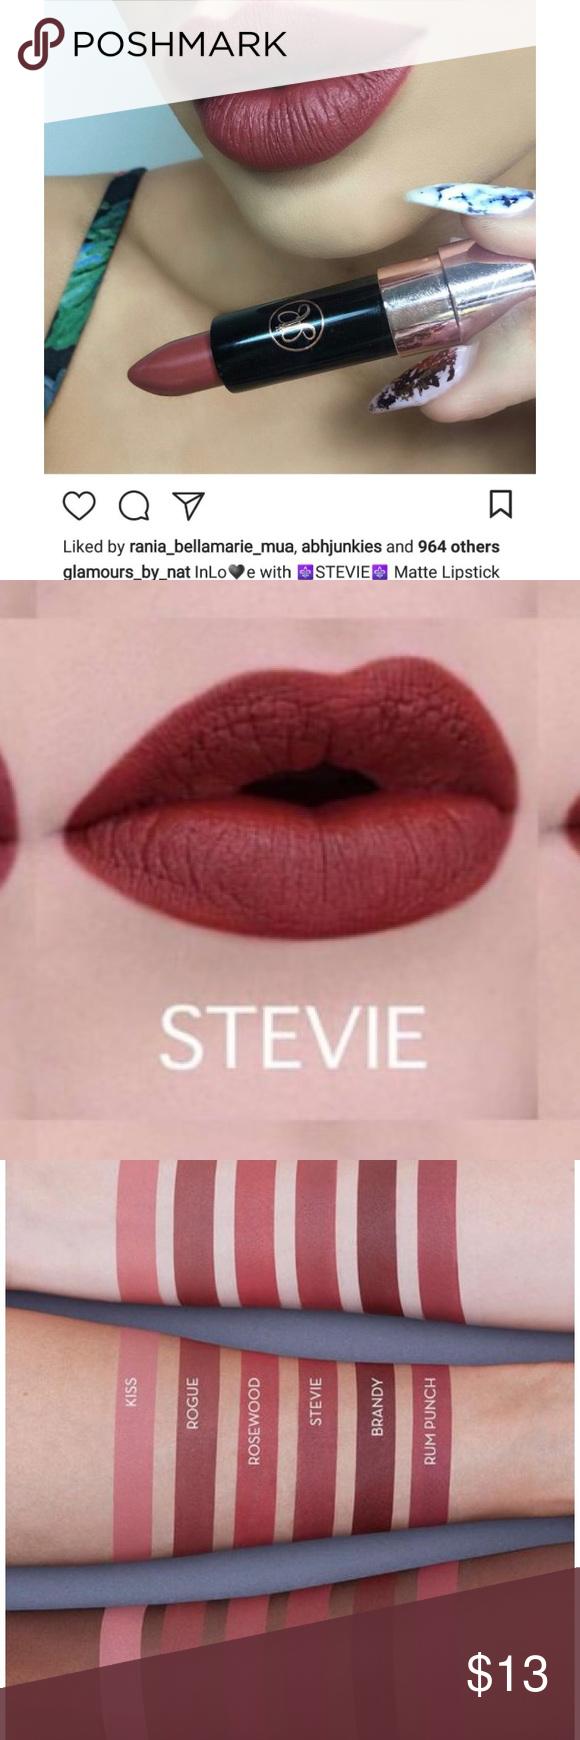 Nib Anastasia Beverly Hills Matte Lipstick Matte Lipstick Brands Lipstick Brands Lipstick